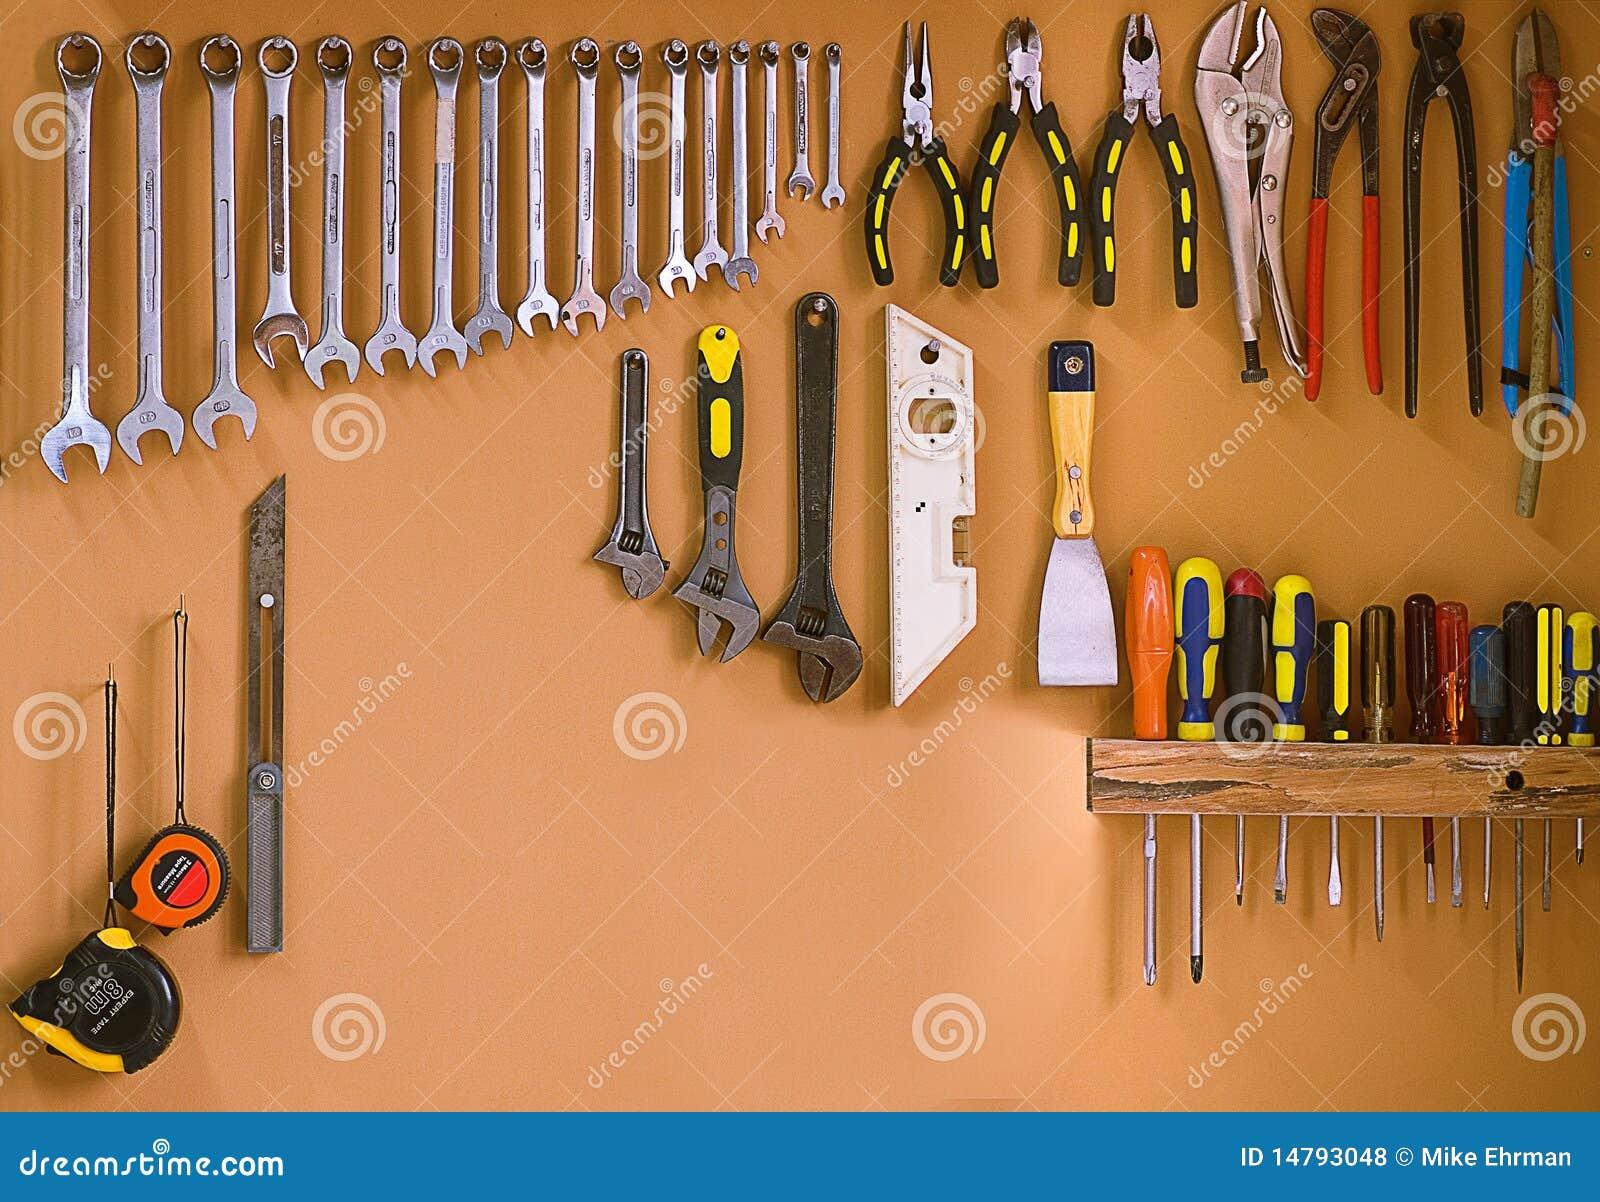 Workshop Tools Royalty Free Stock Photos - Image: 14793048